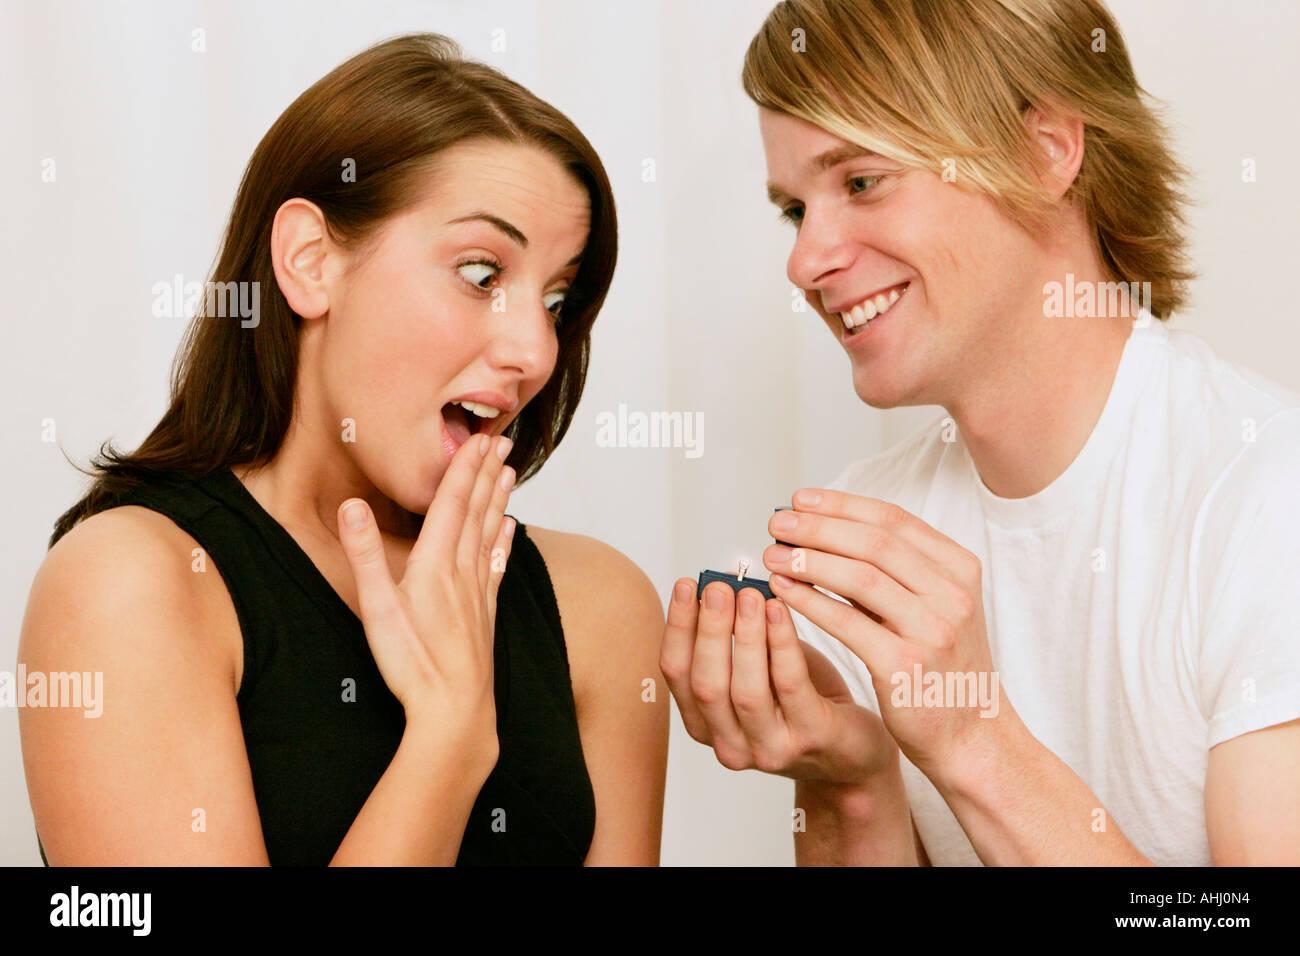 Surprise Wedding Proposals Stock Photos & Surprise Wedding